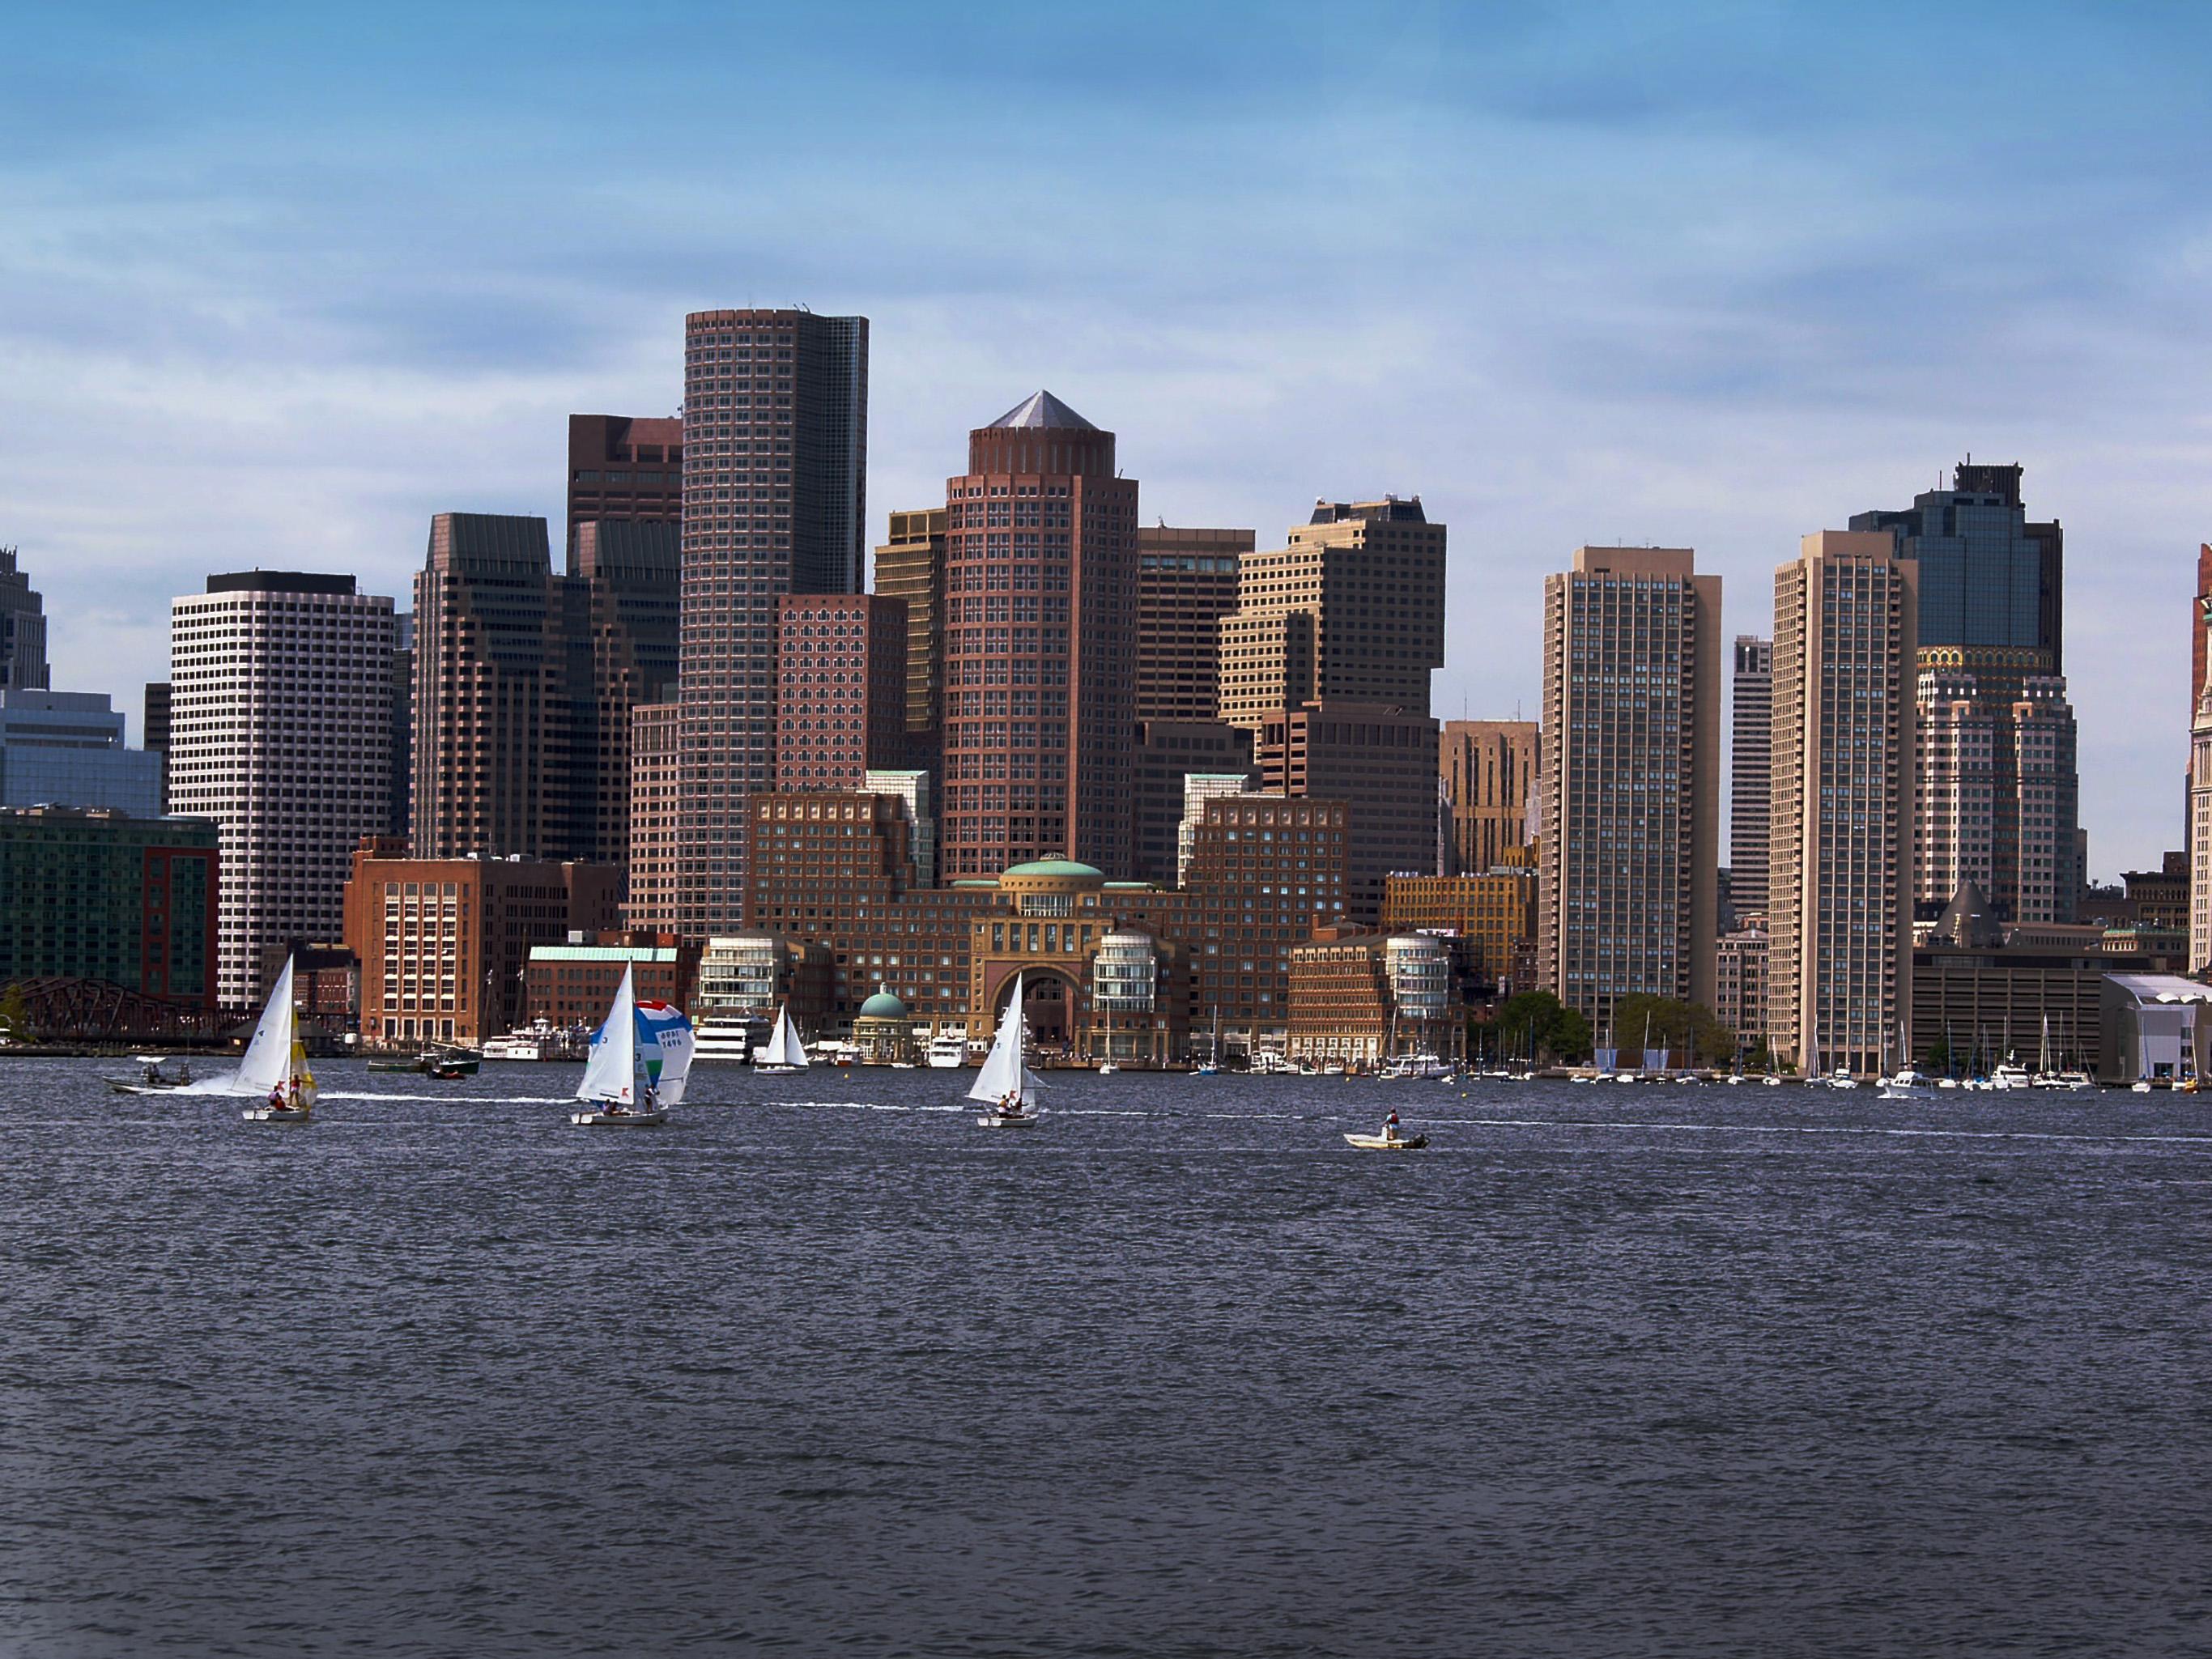 Boston (2019)